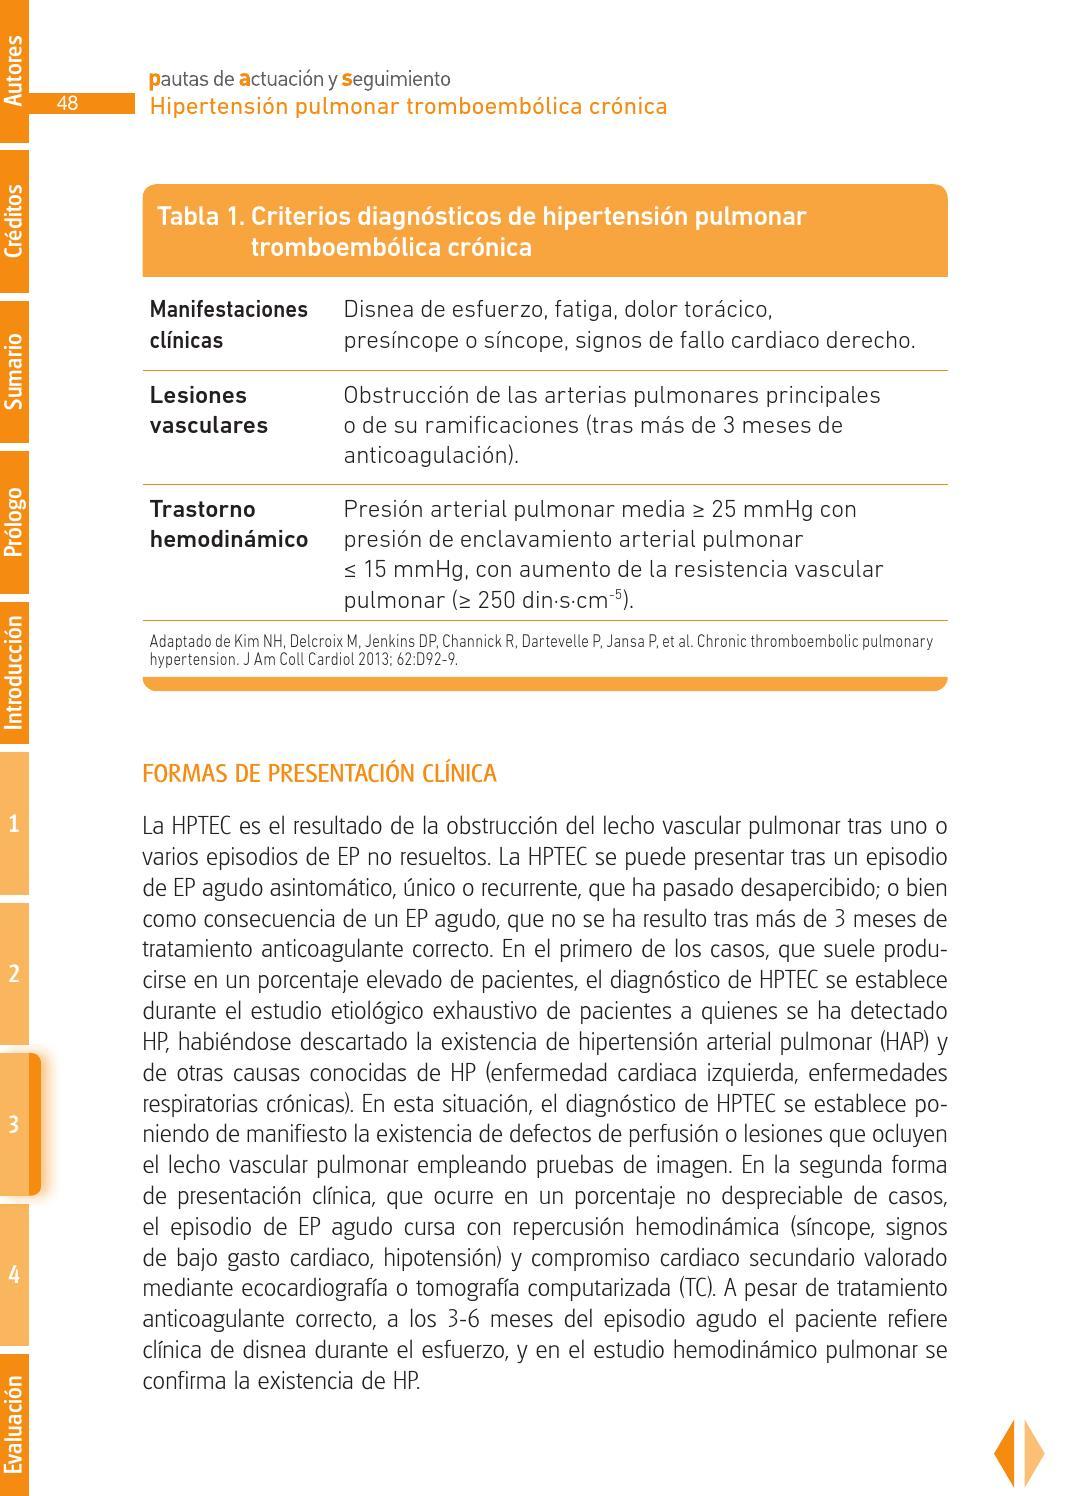 PAS en Hipertensión Pulmonar Tromboembólica Crónica by..